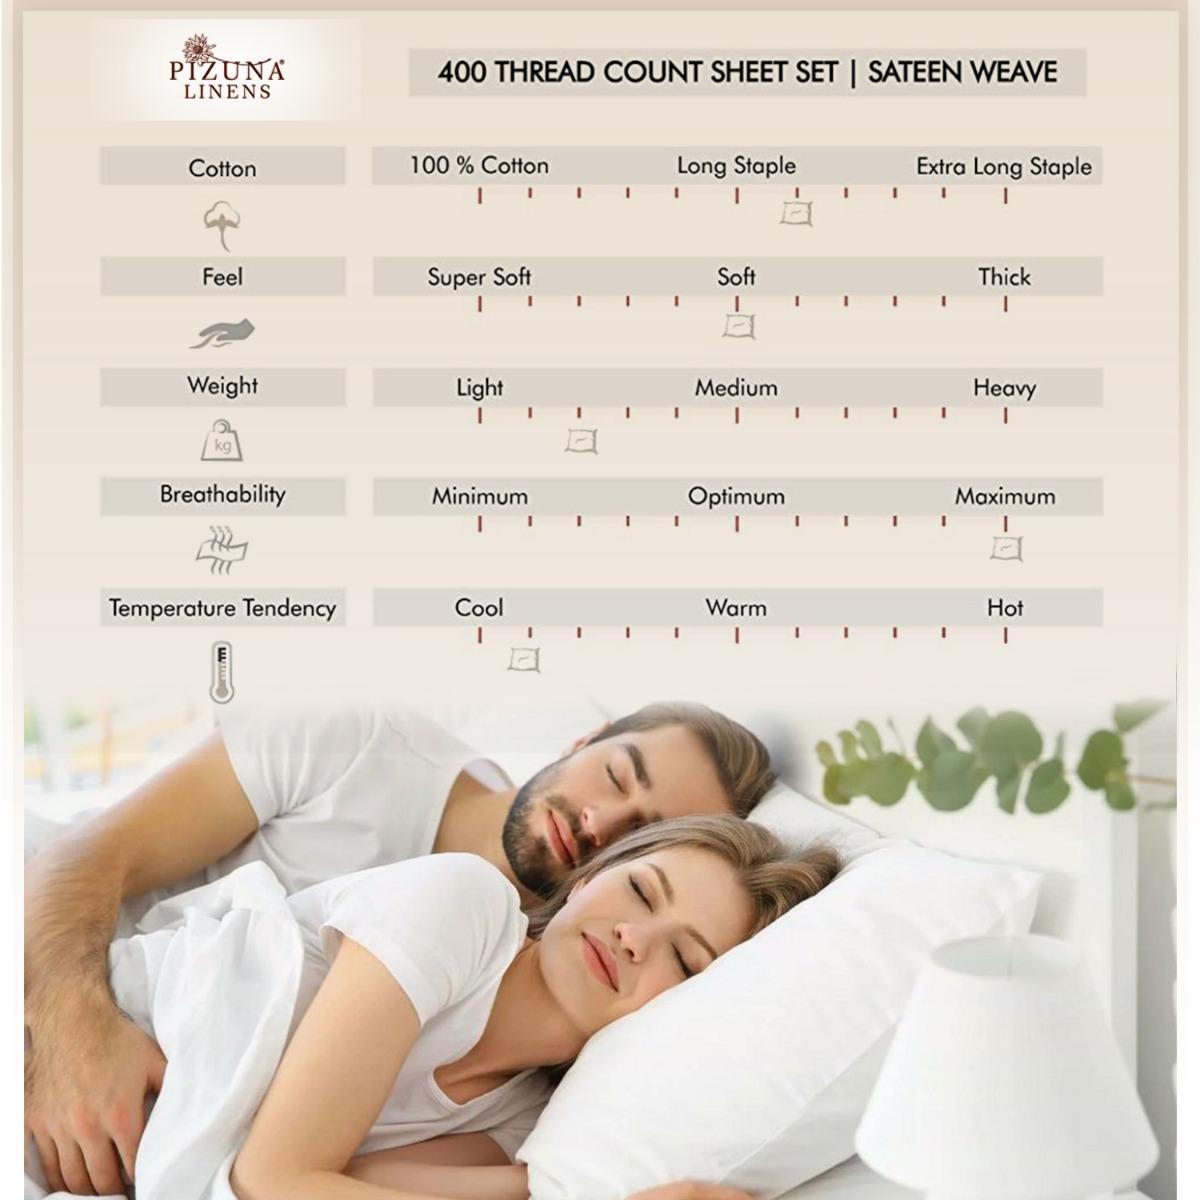 pizuna linens 400 thread count cotton pillow cases